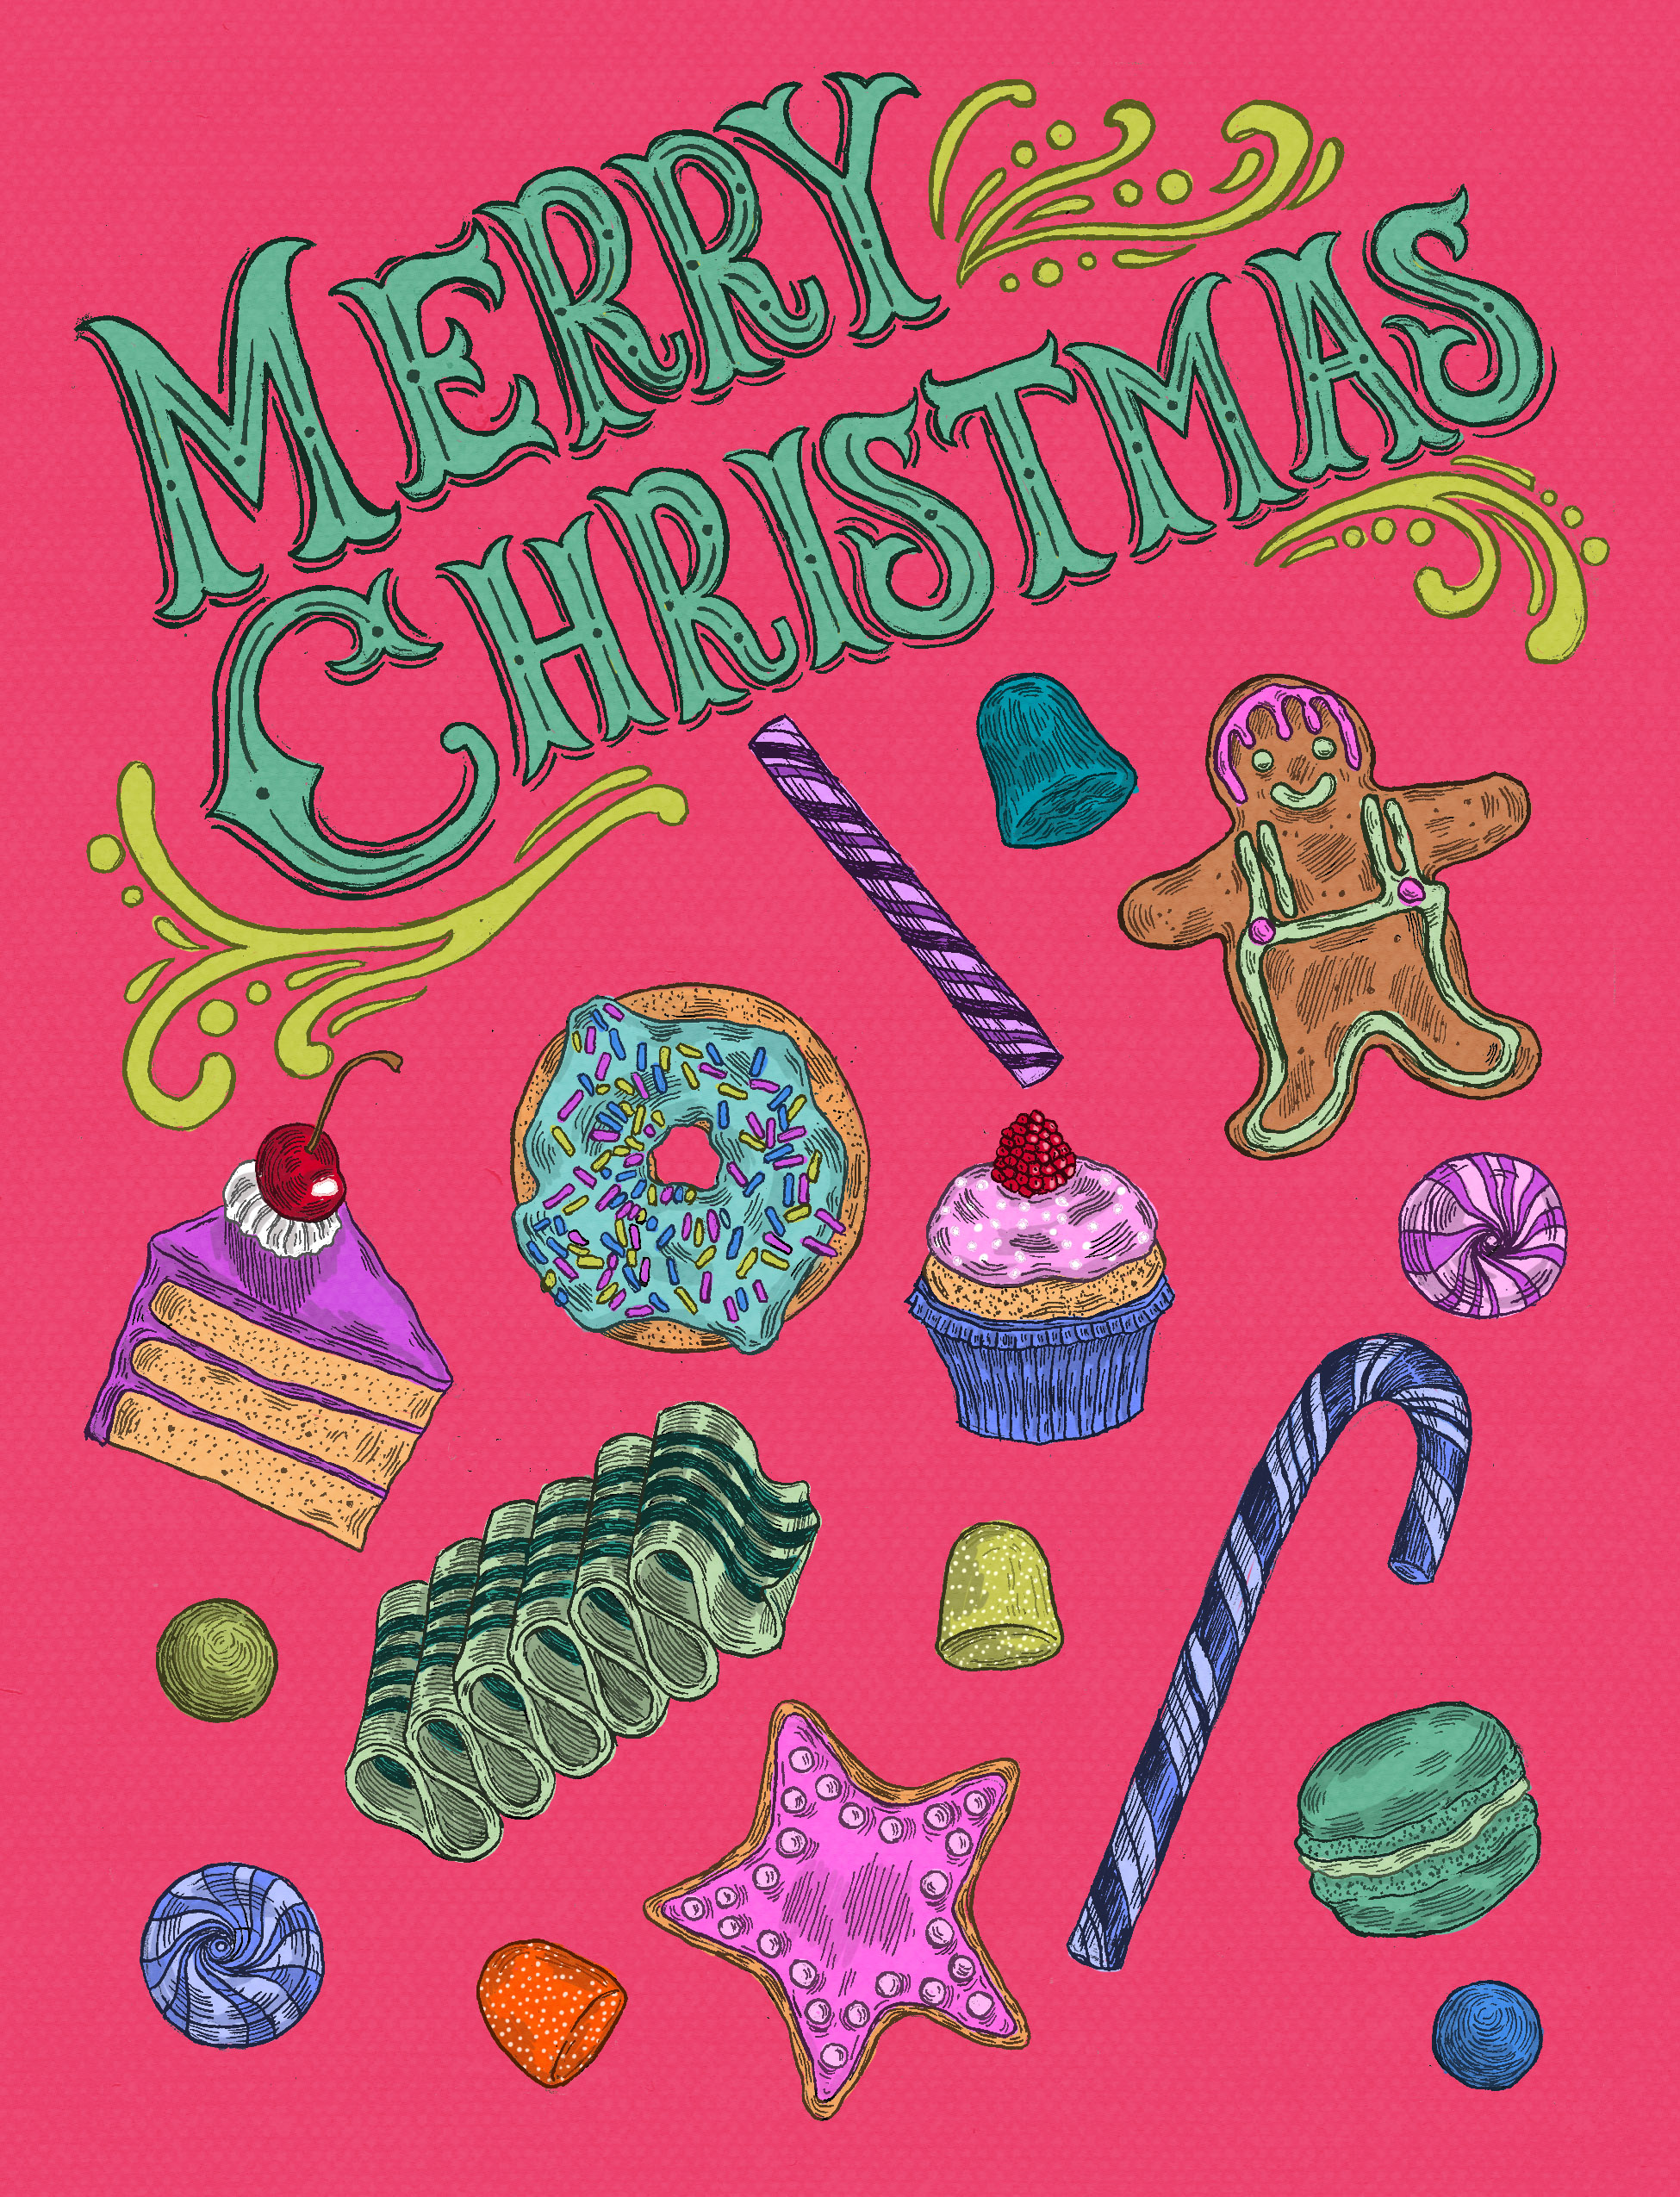 Merry Christmas 1.jpg